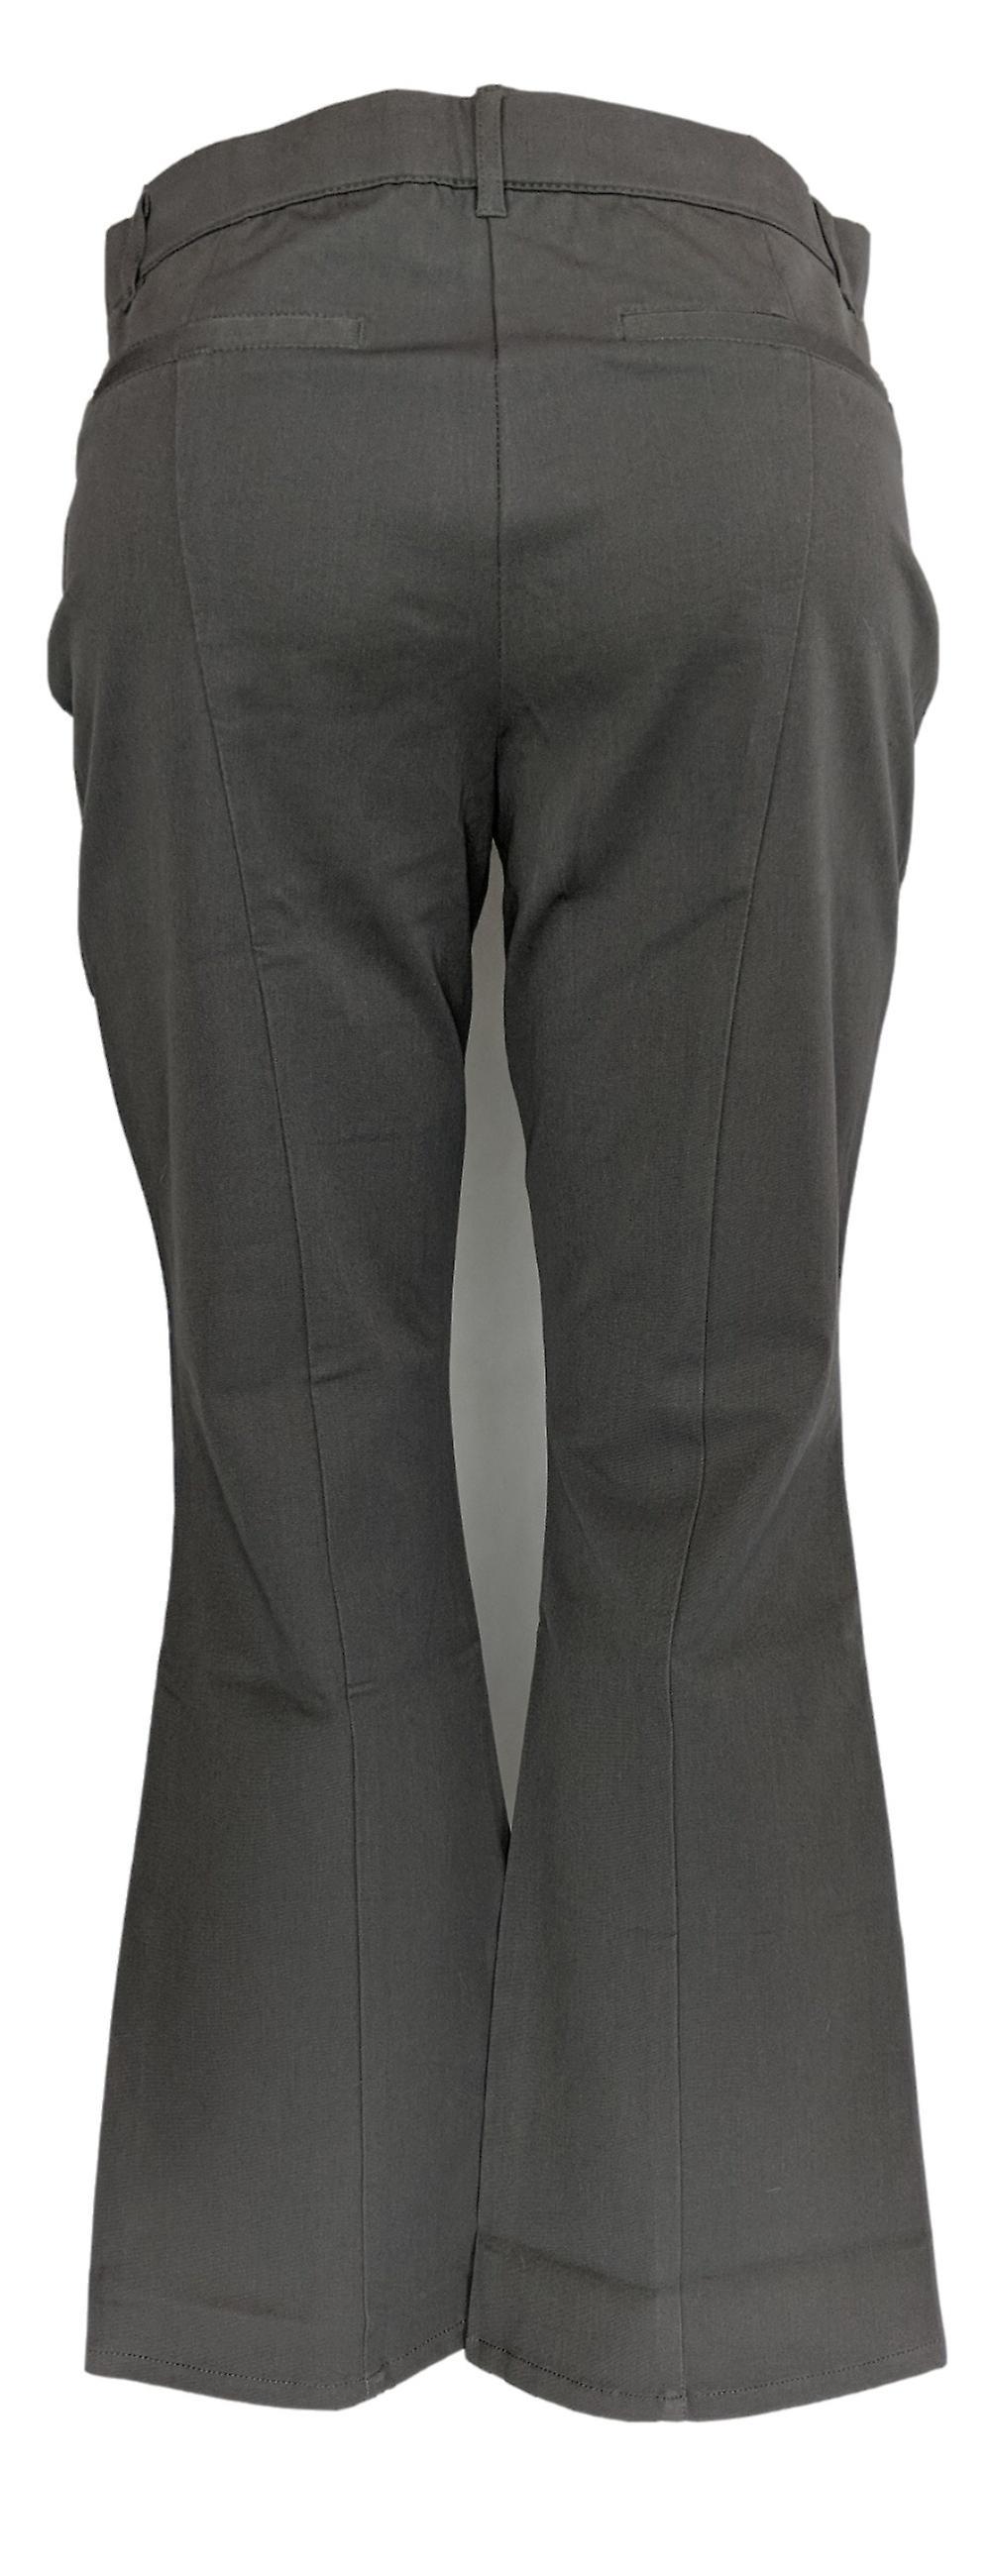 Isaac Mizrahi Live! Women's Petite Pants 24/7 Stretch Boot Cut Gray A279254 c92J4V